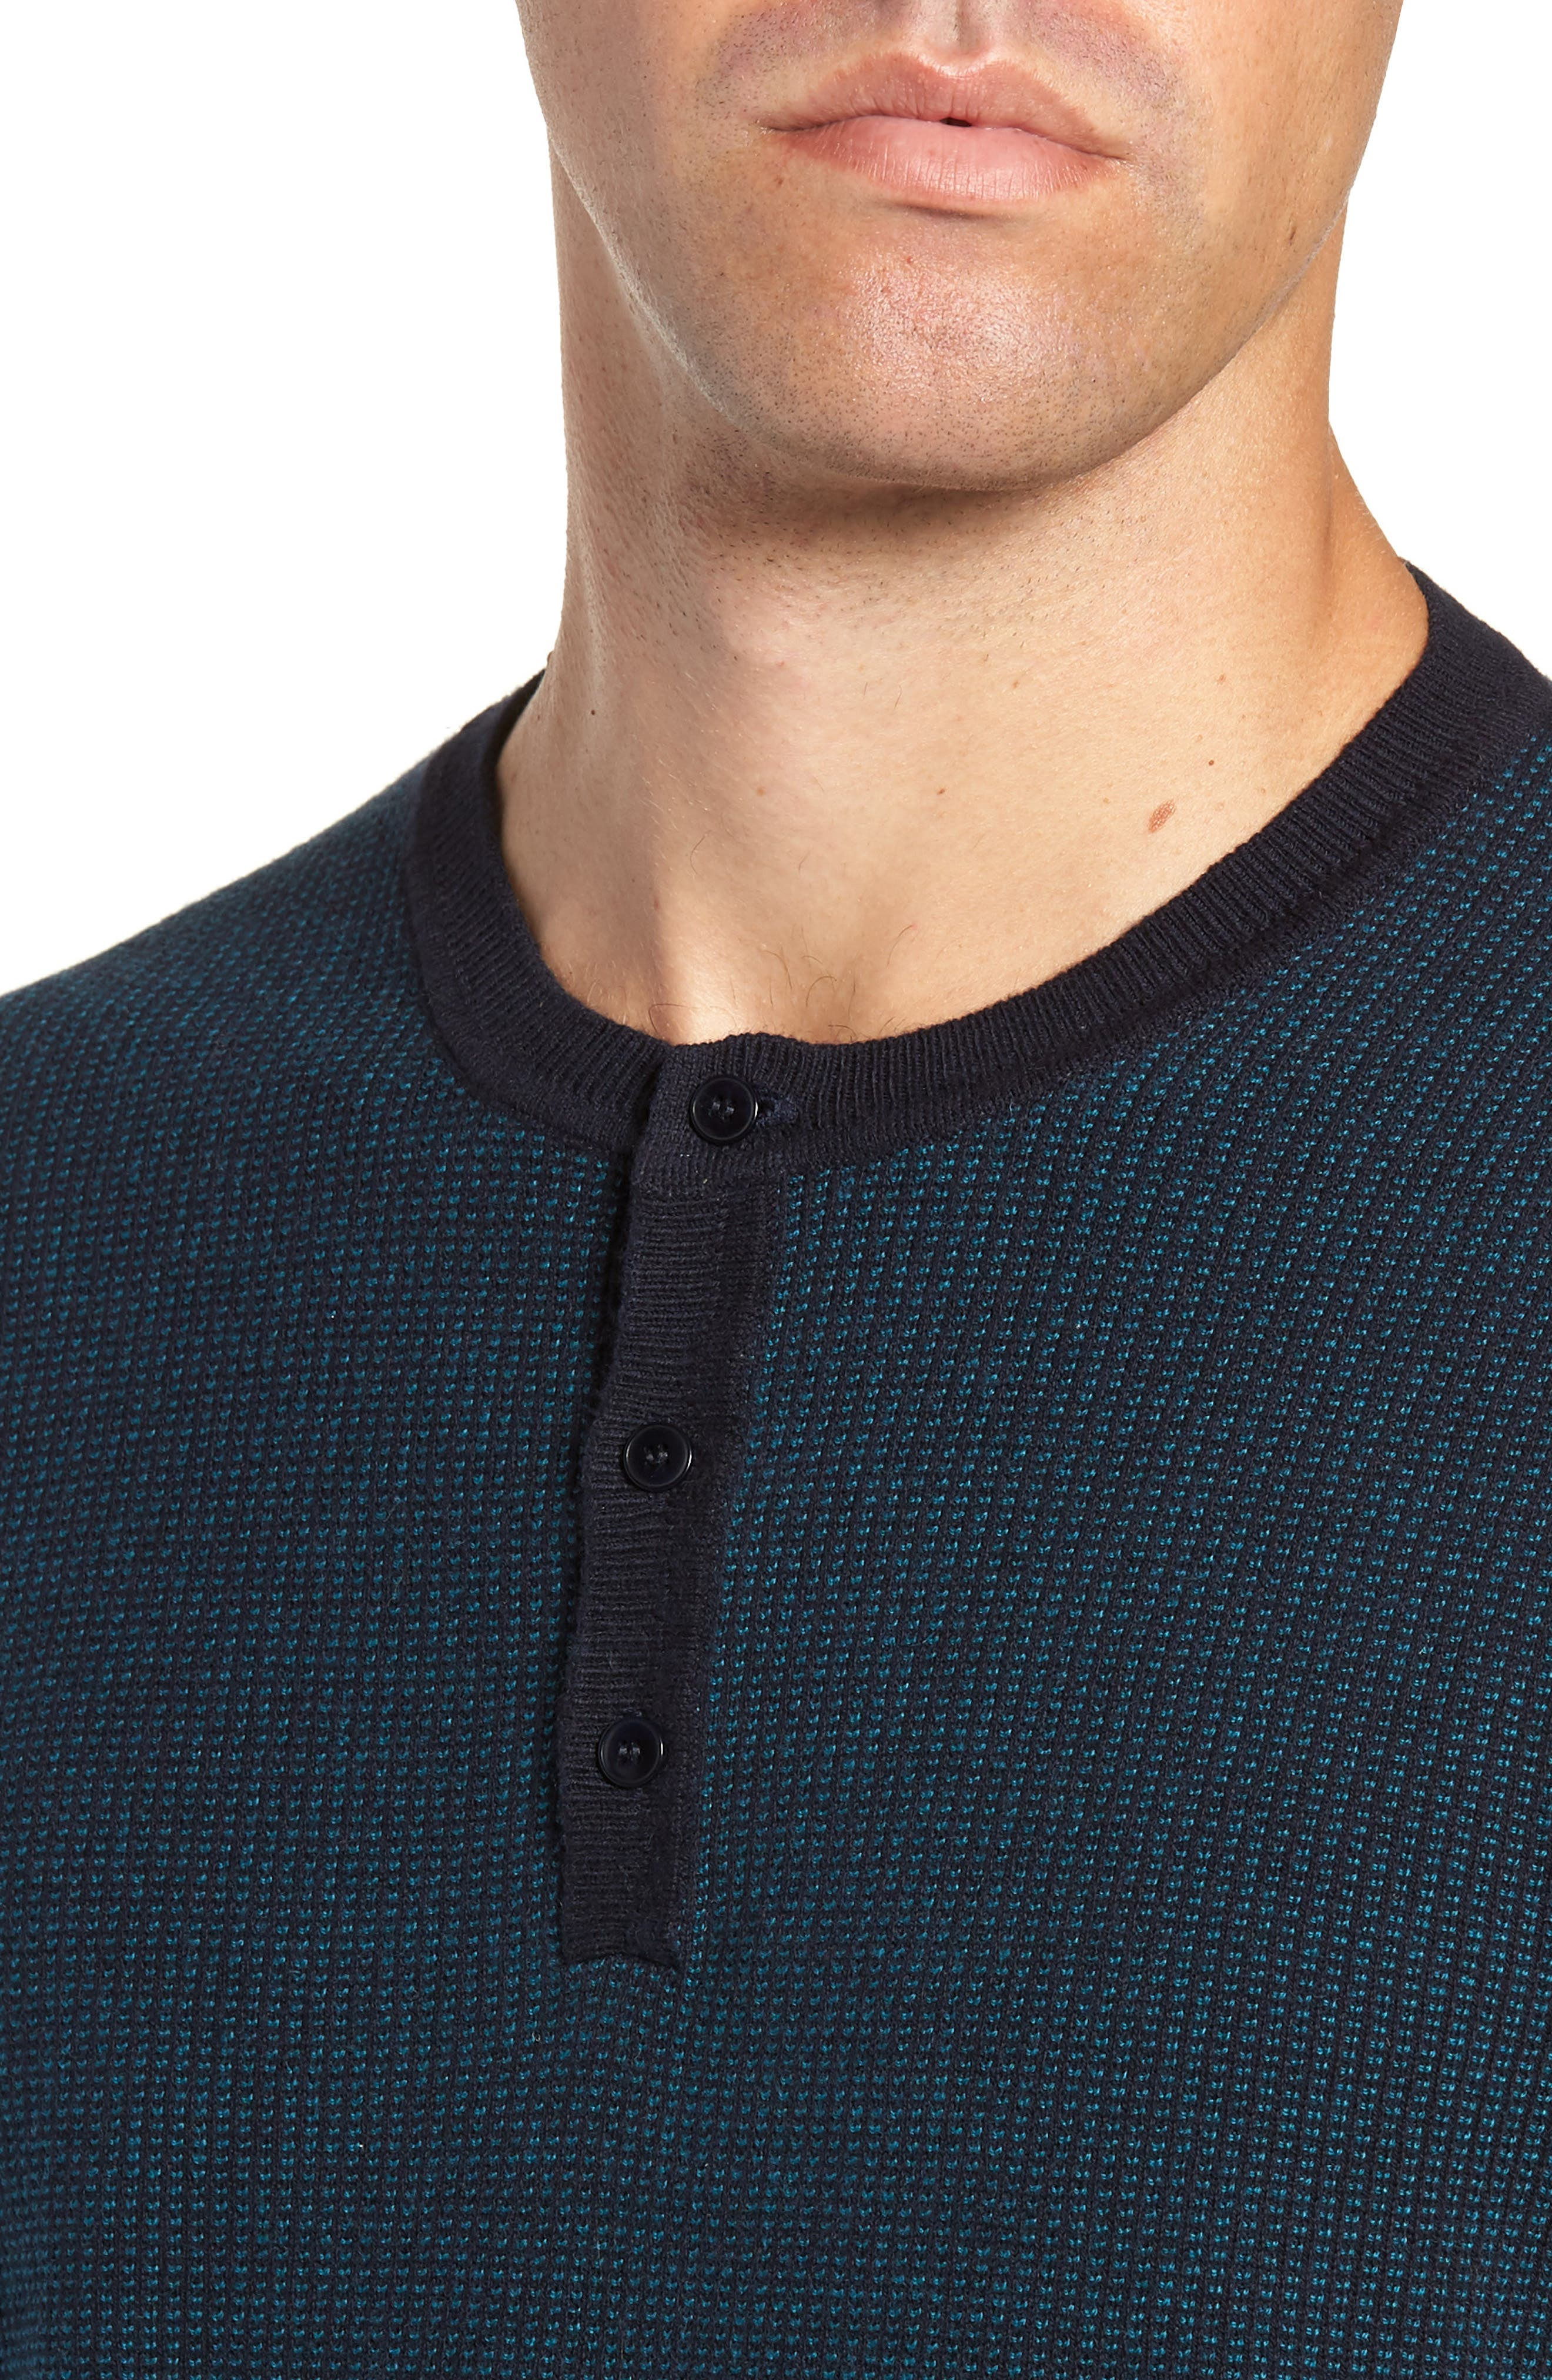 Kimball Henley Sweater,                             Alternate thumbnail 4, color,                             EMERALD